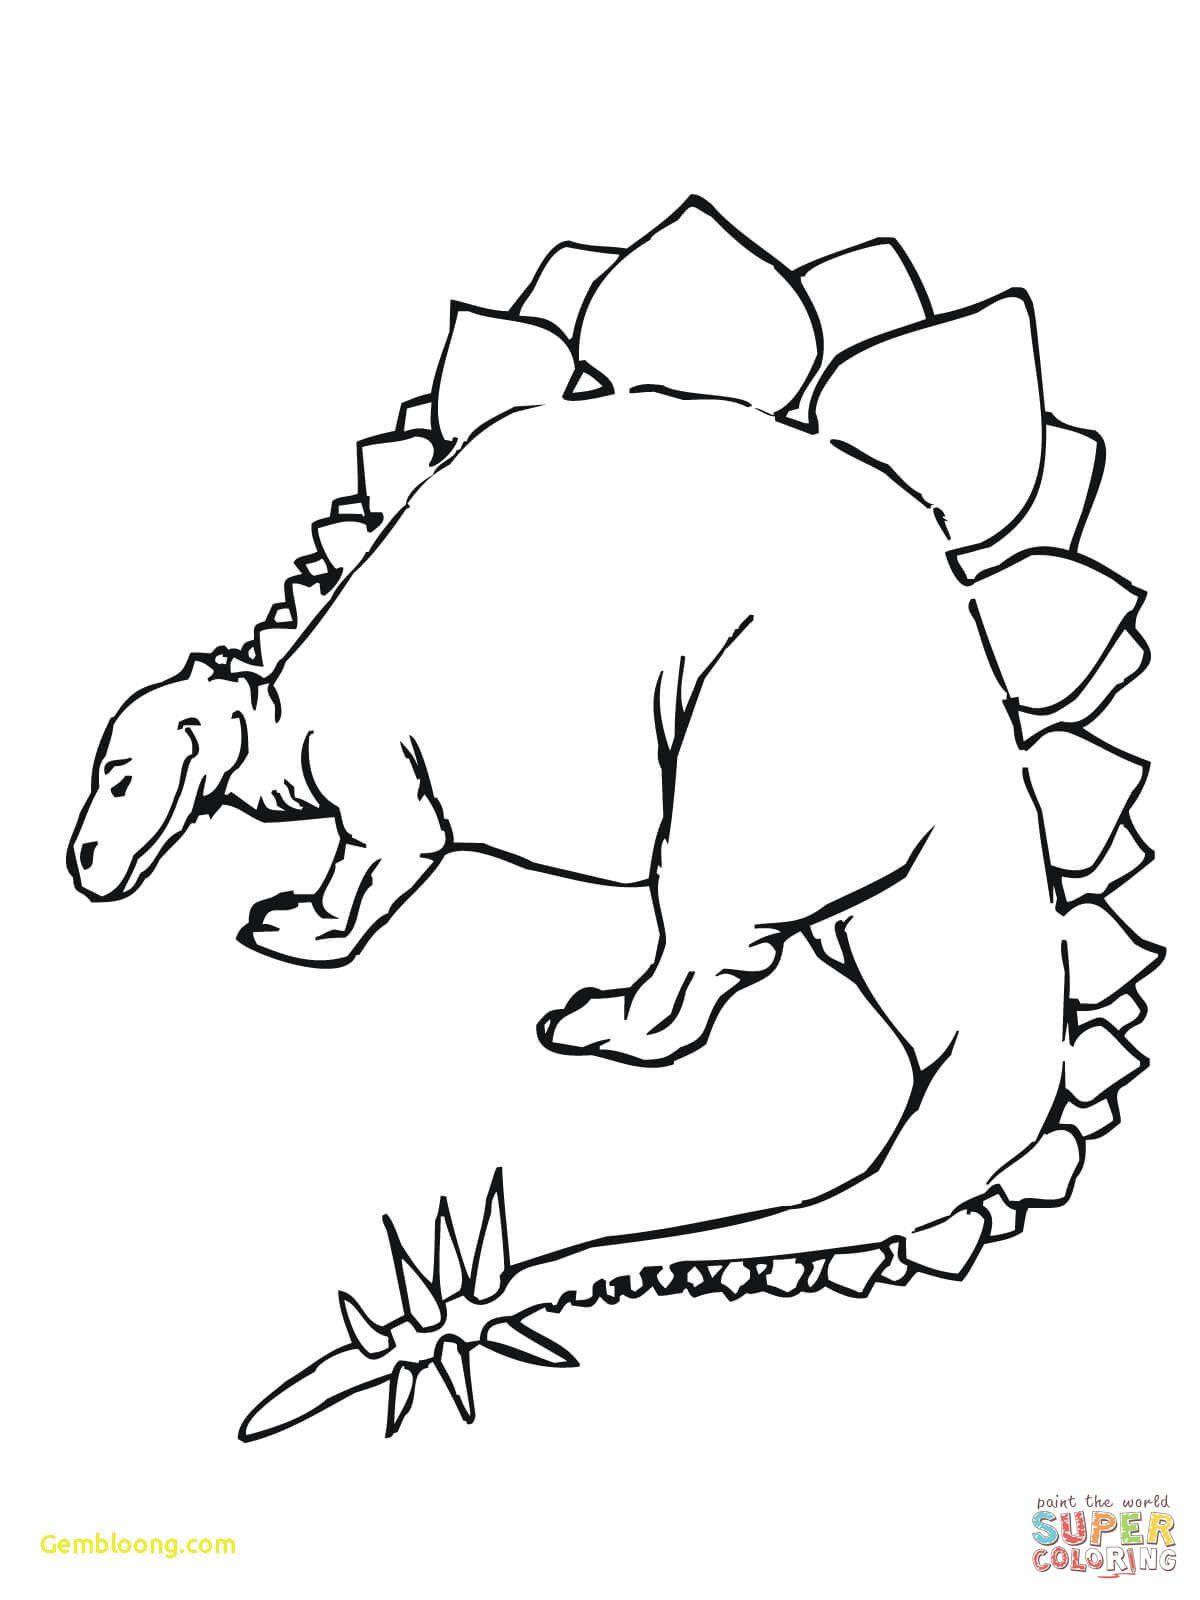 Dinosaur Coloring Book Printable Coloring Pages Dinosaur Template Printable Awesome Dieren Kleurplaten Dinosaurus Kleurplaten